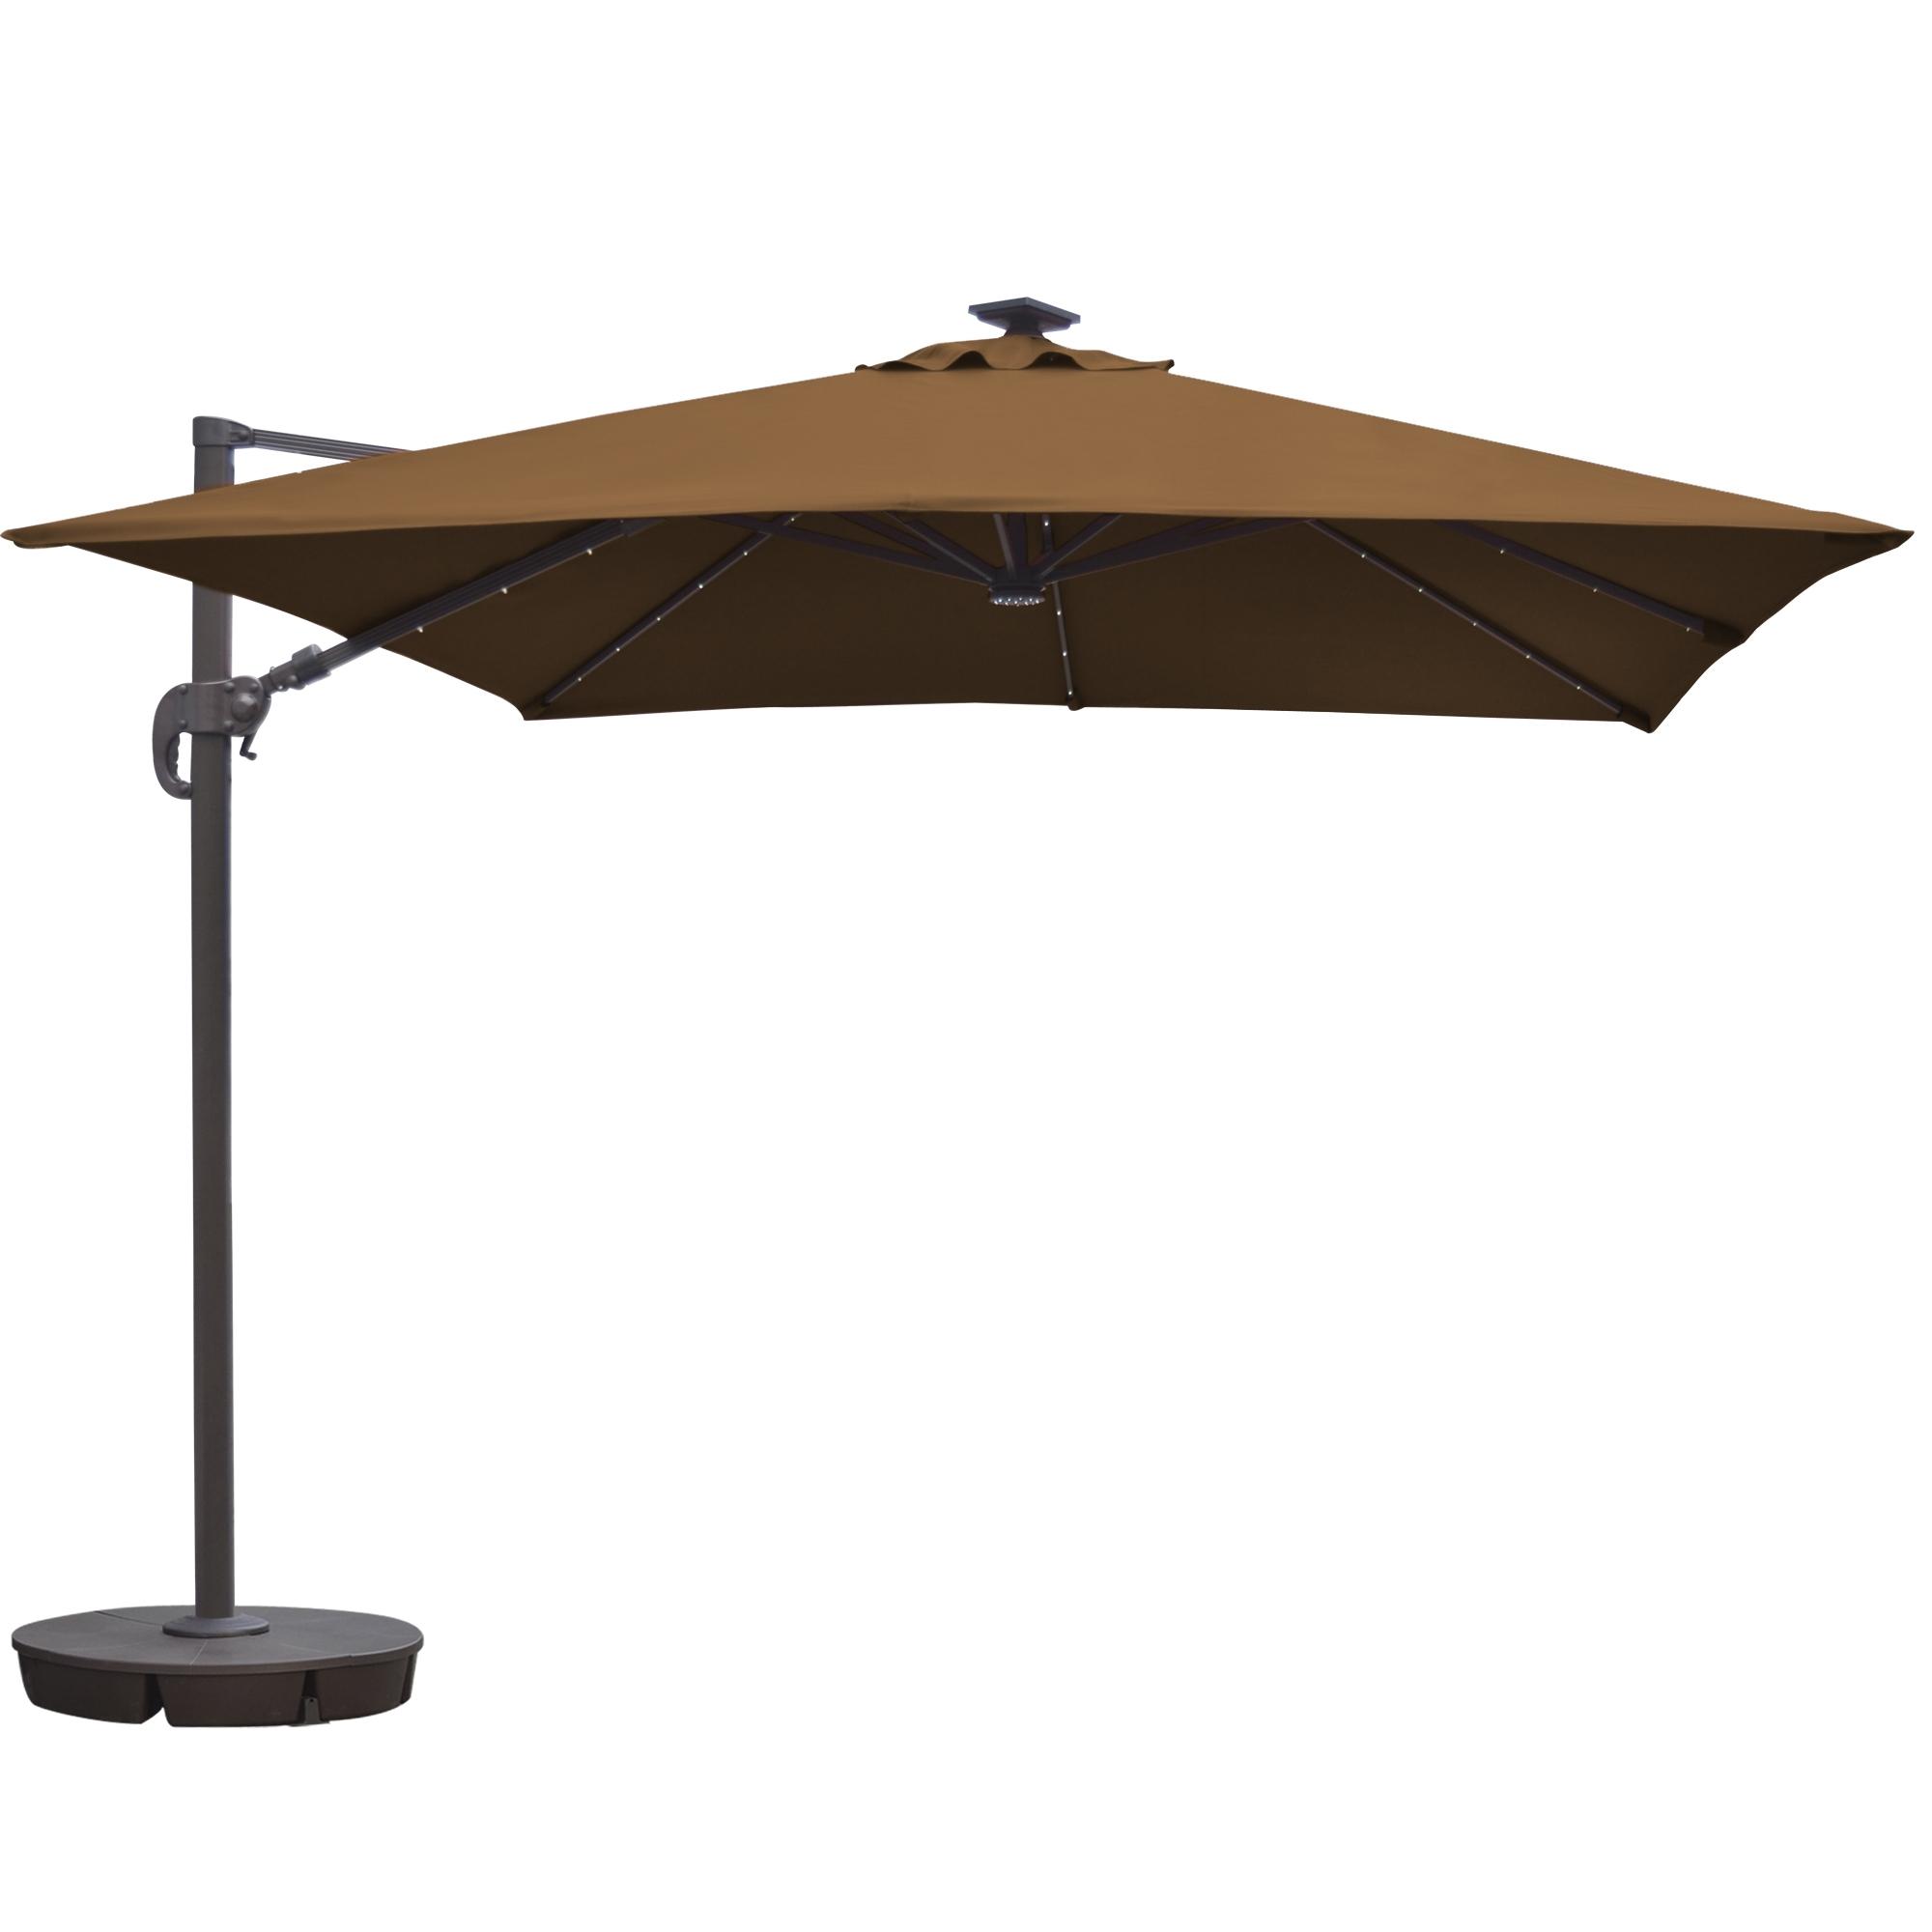 Island Umbrella Santorini Ii Fiesta 10 Ft Square Cantilever Solar Throughout 2018 Square Cantilever Patio Umbrellas (Gallery 12 of 20)